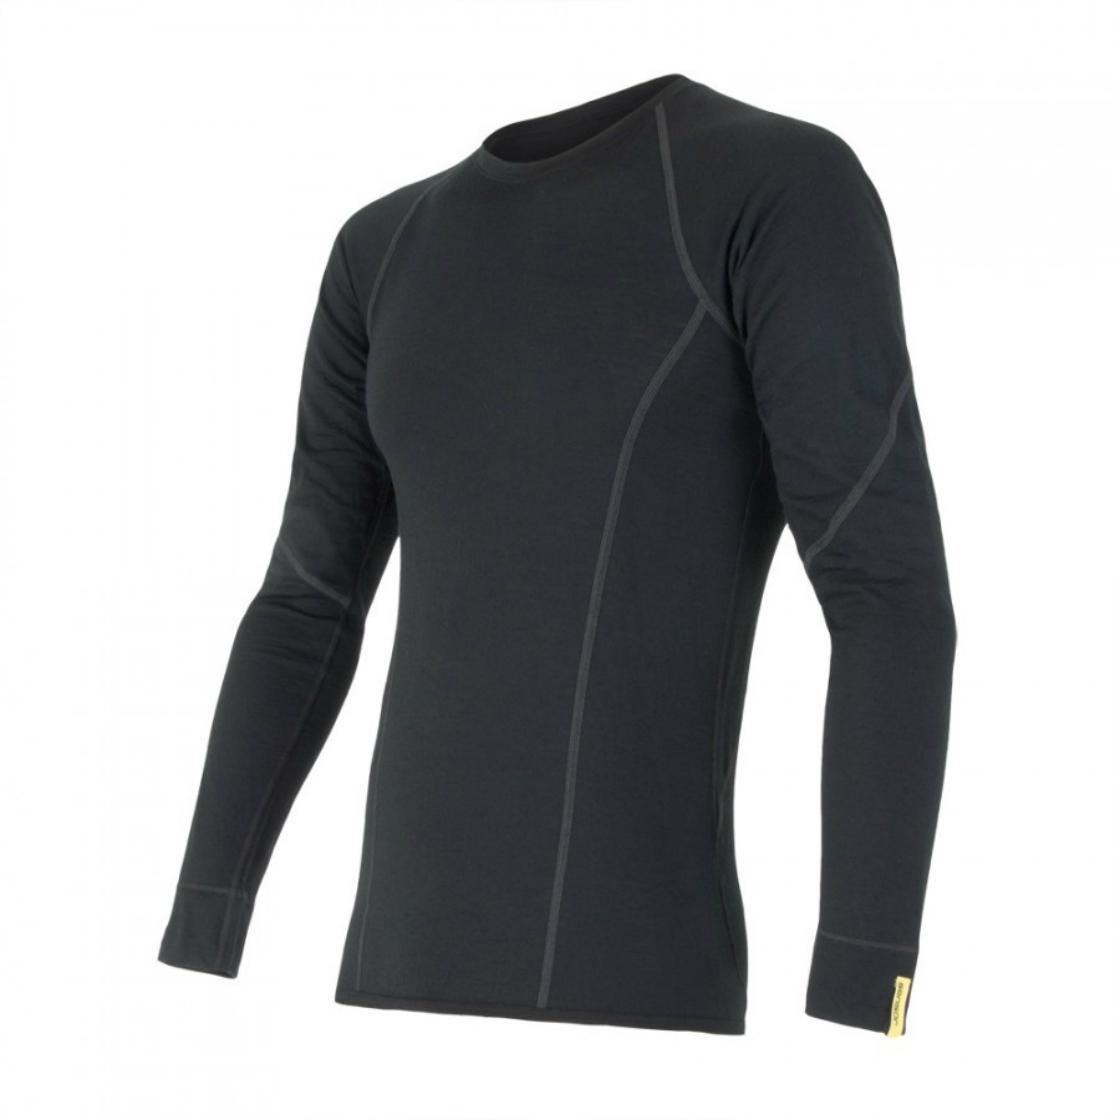 f4da63ef2b57 pánske Sensor Merino Wool Active - Sensor merino wool active tričko čierne dlhý  rukáv